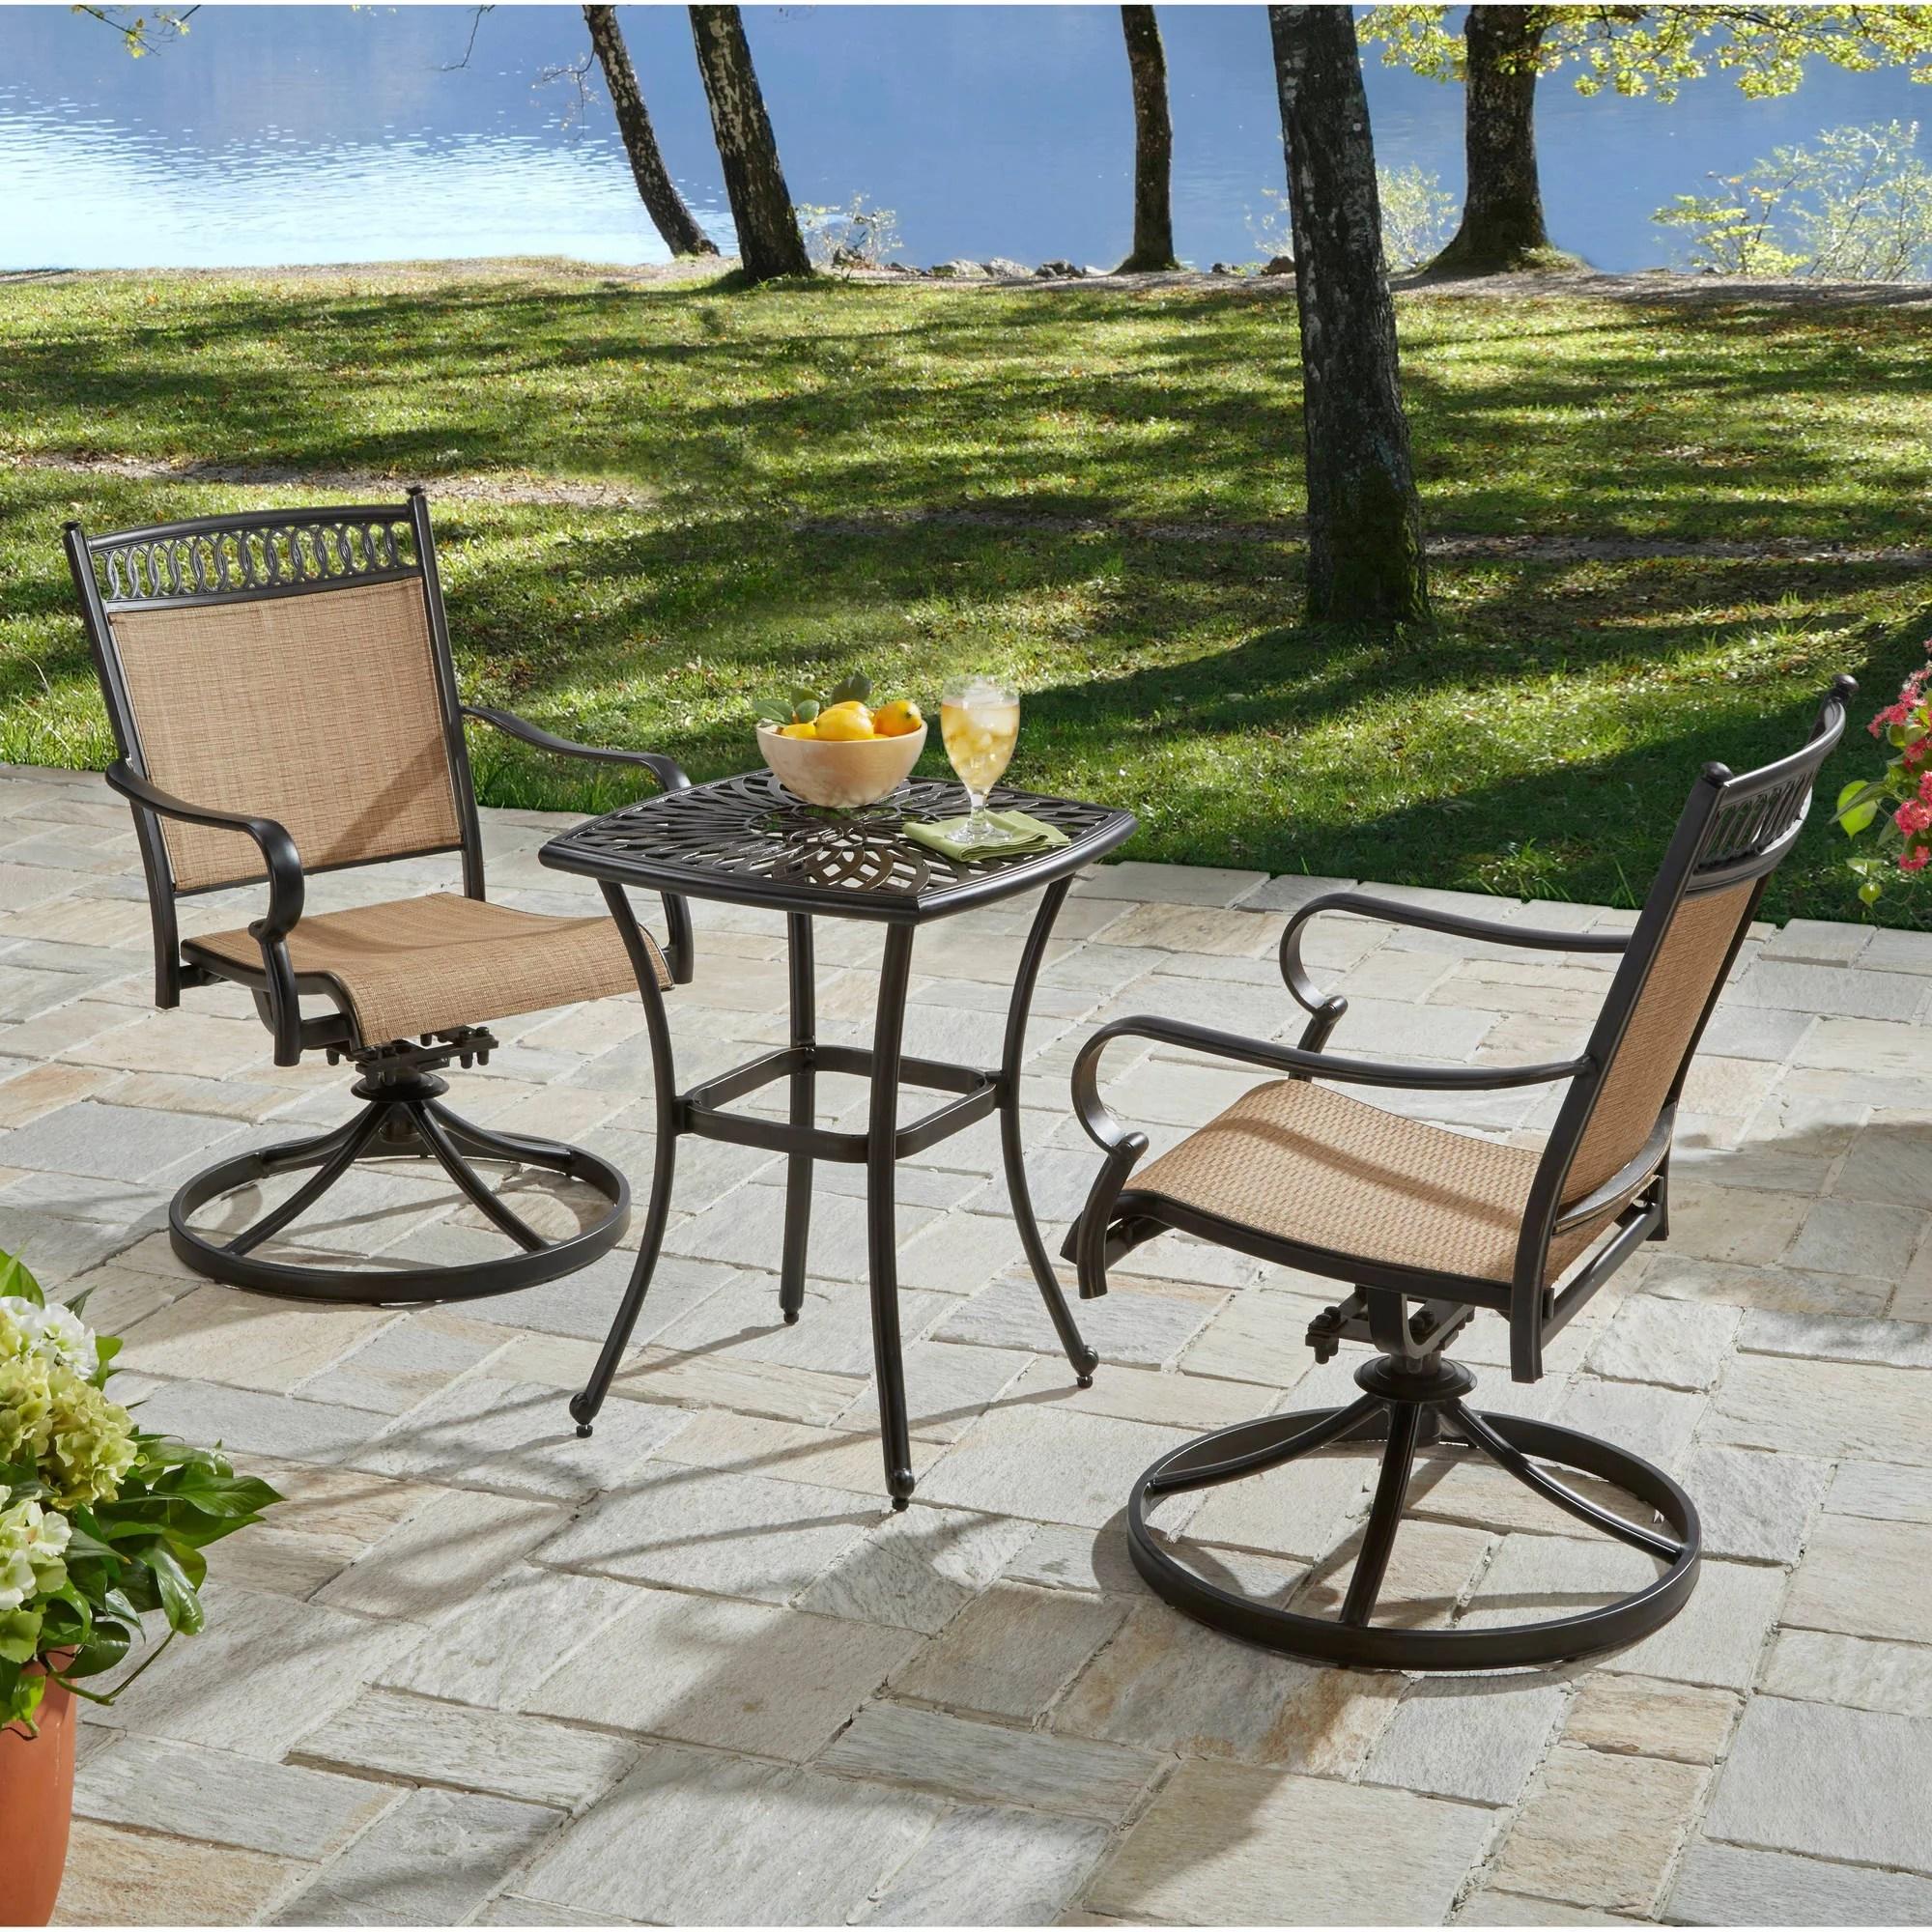 3 piece outdoor table and chairs wooden adirondack better homes gardens warrens bistro set walmart com